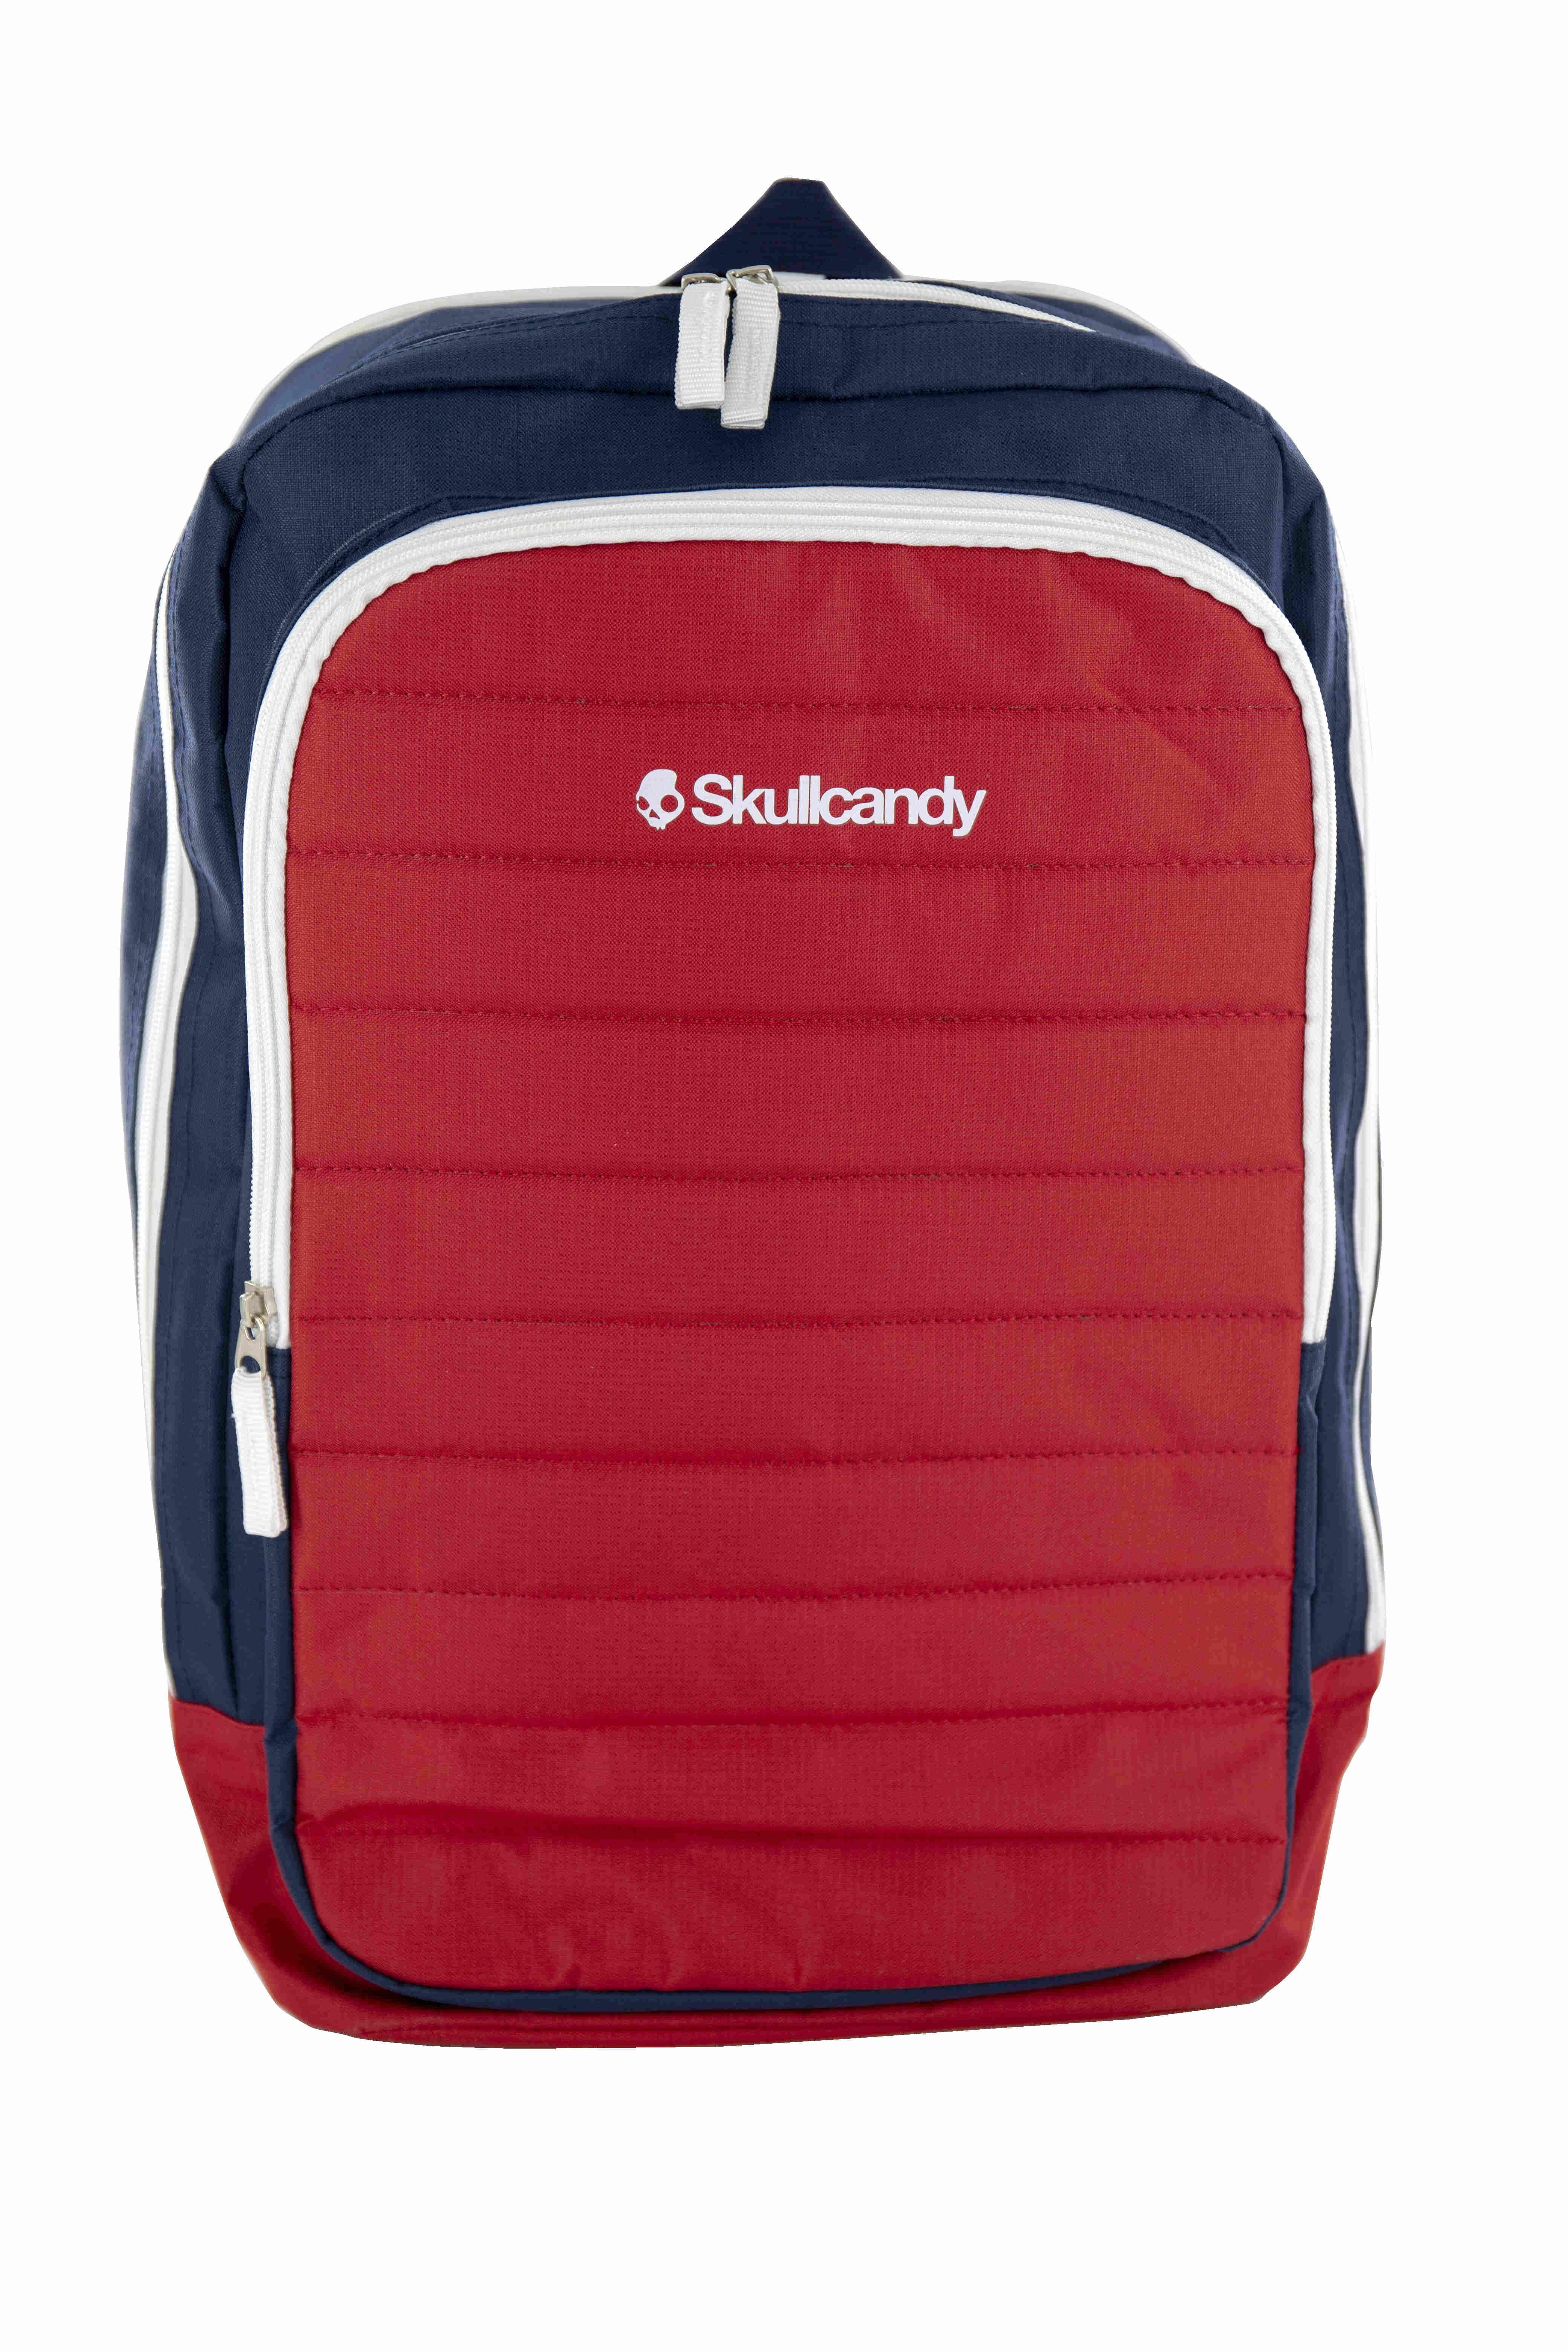 Skullcandy Square Backpack - Blazing Red